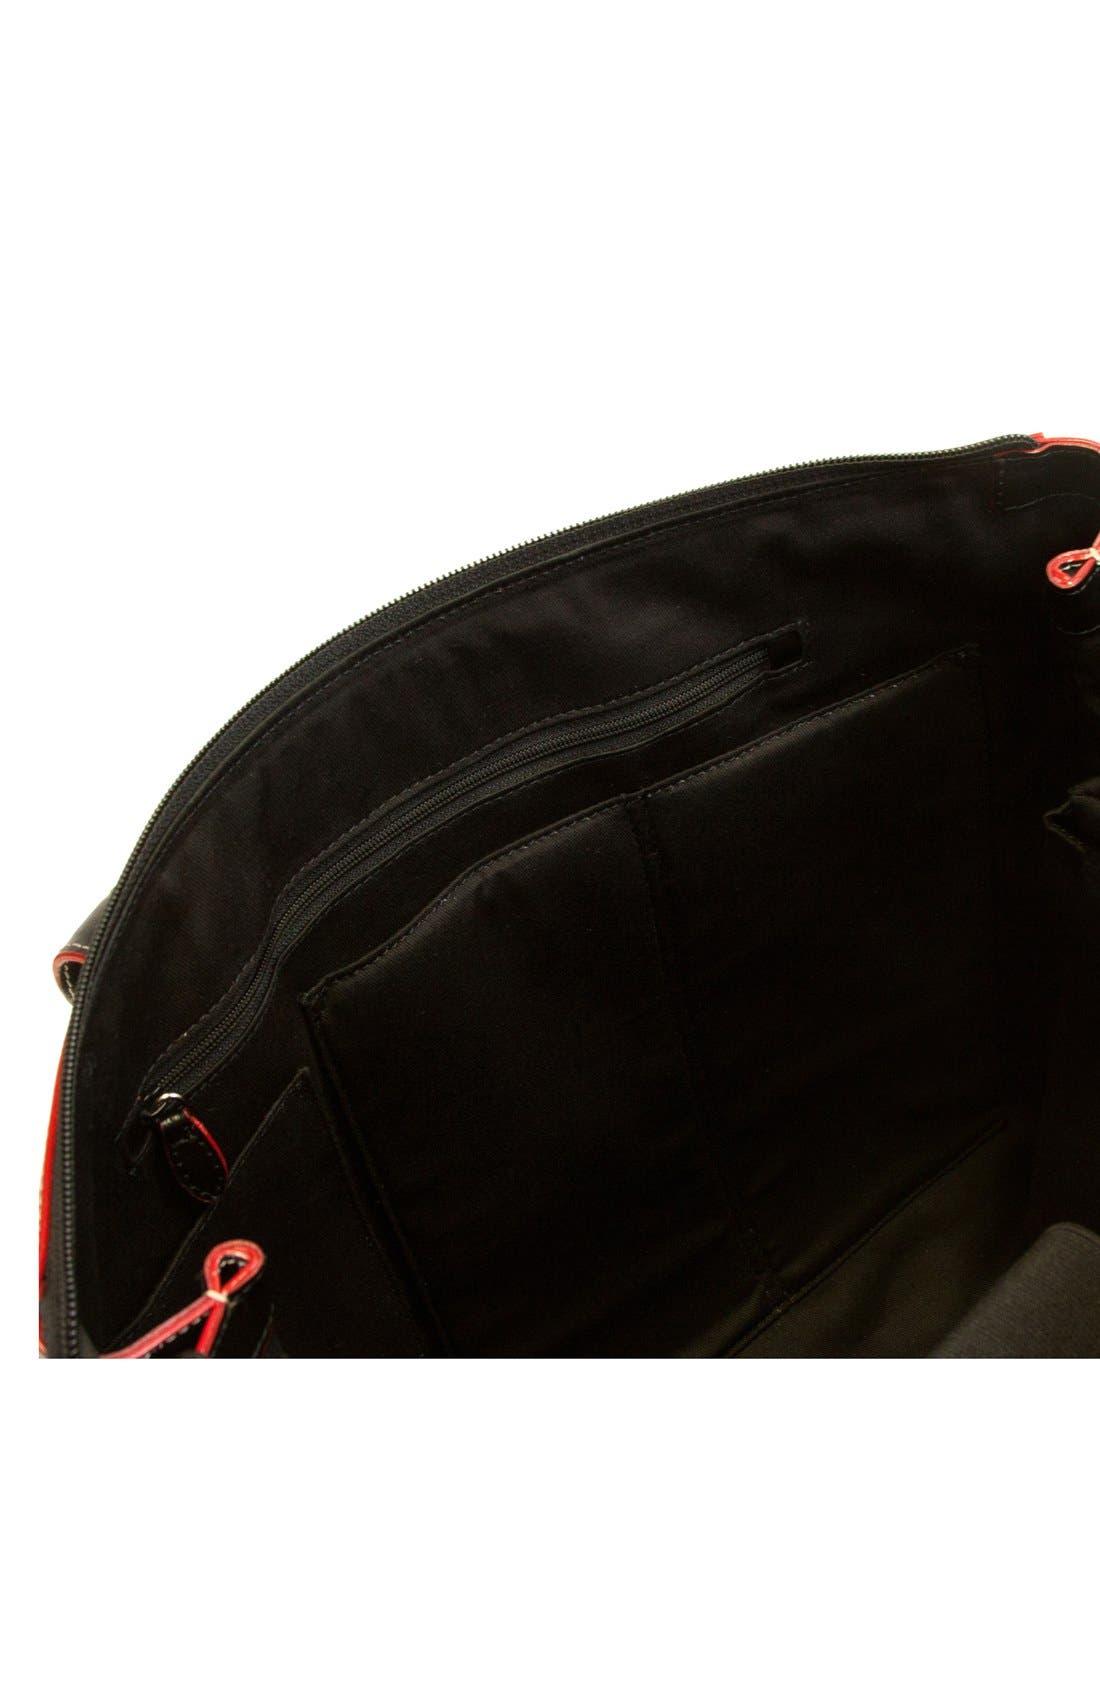 Alternate Image 3  - Lodis Audrey Wilhelmina Leather Work Satchel